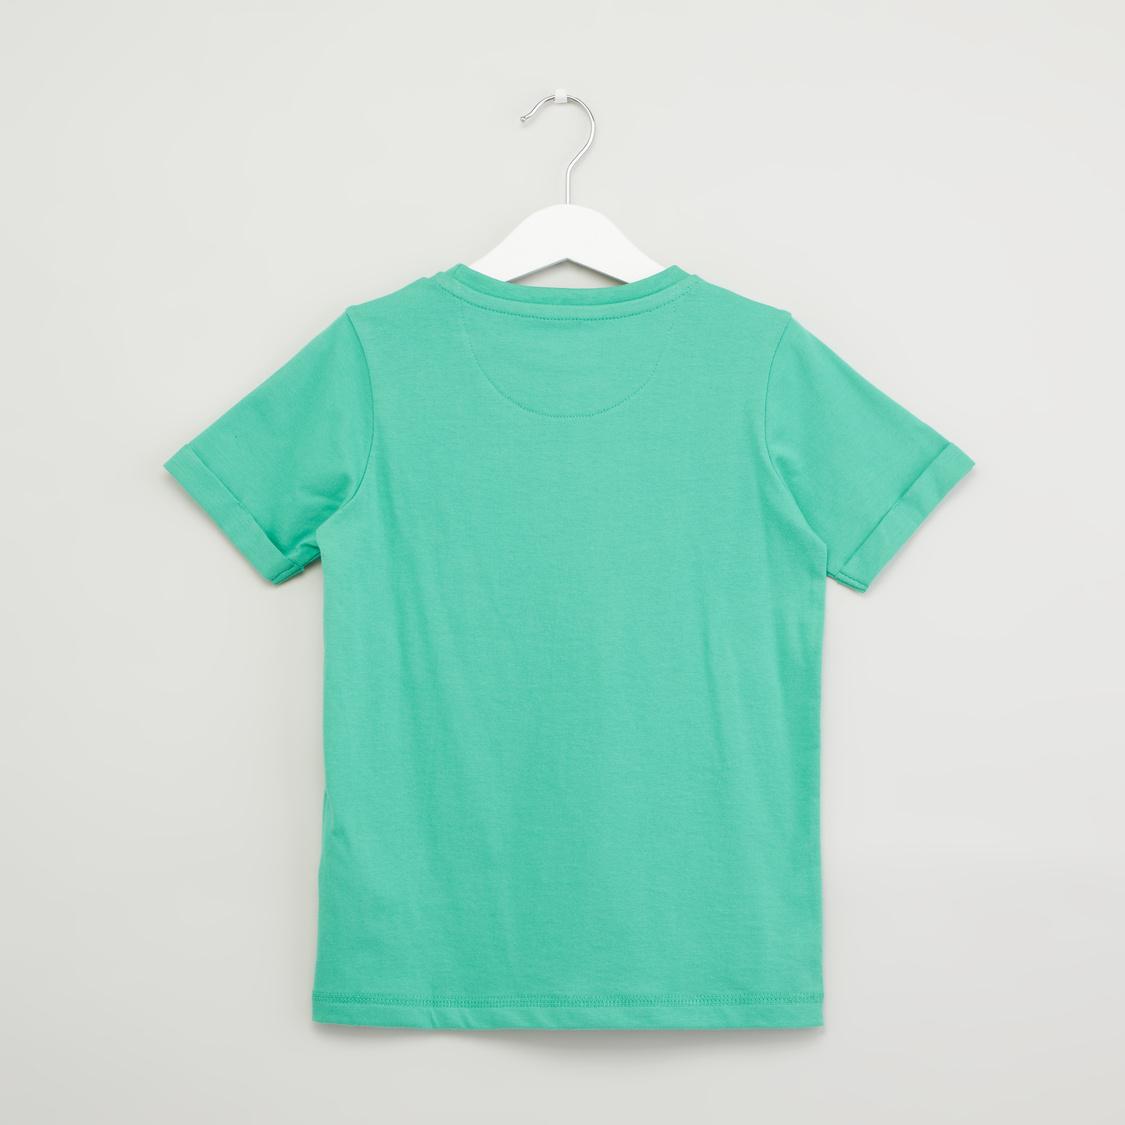 Printed Short Sleeves T-shirt with Denim Shorts